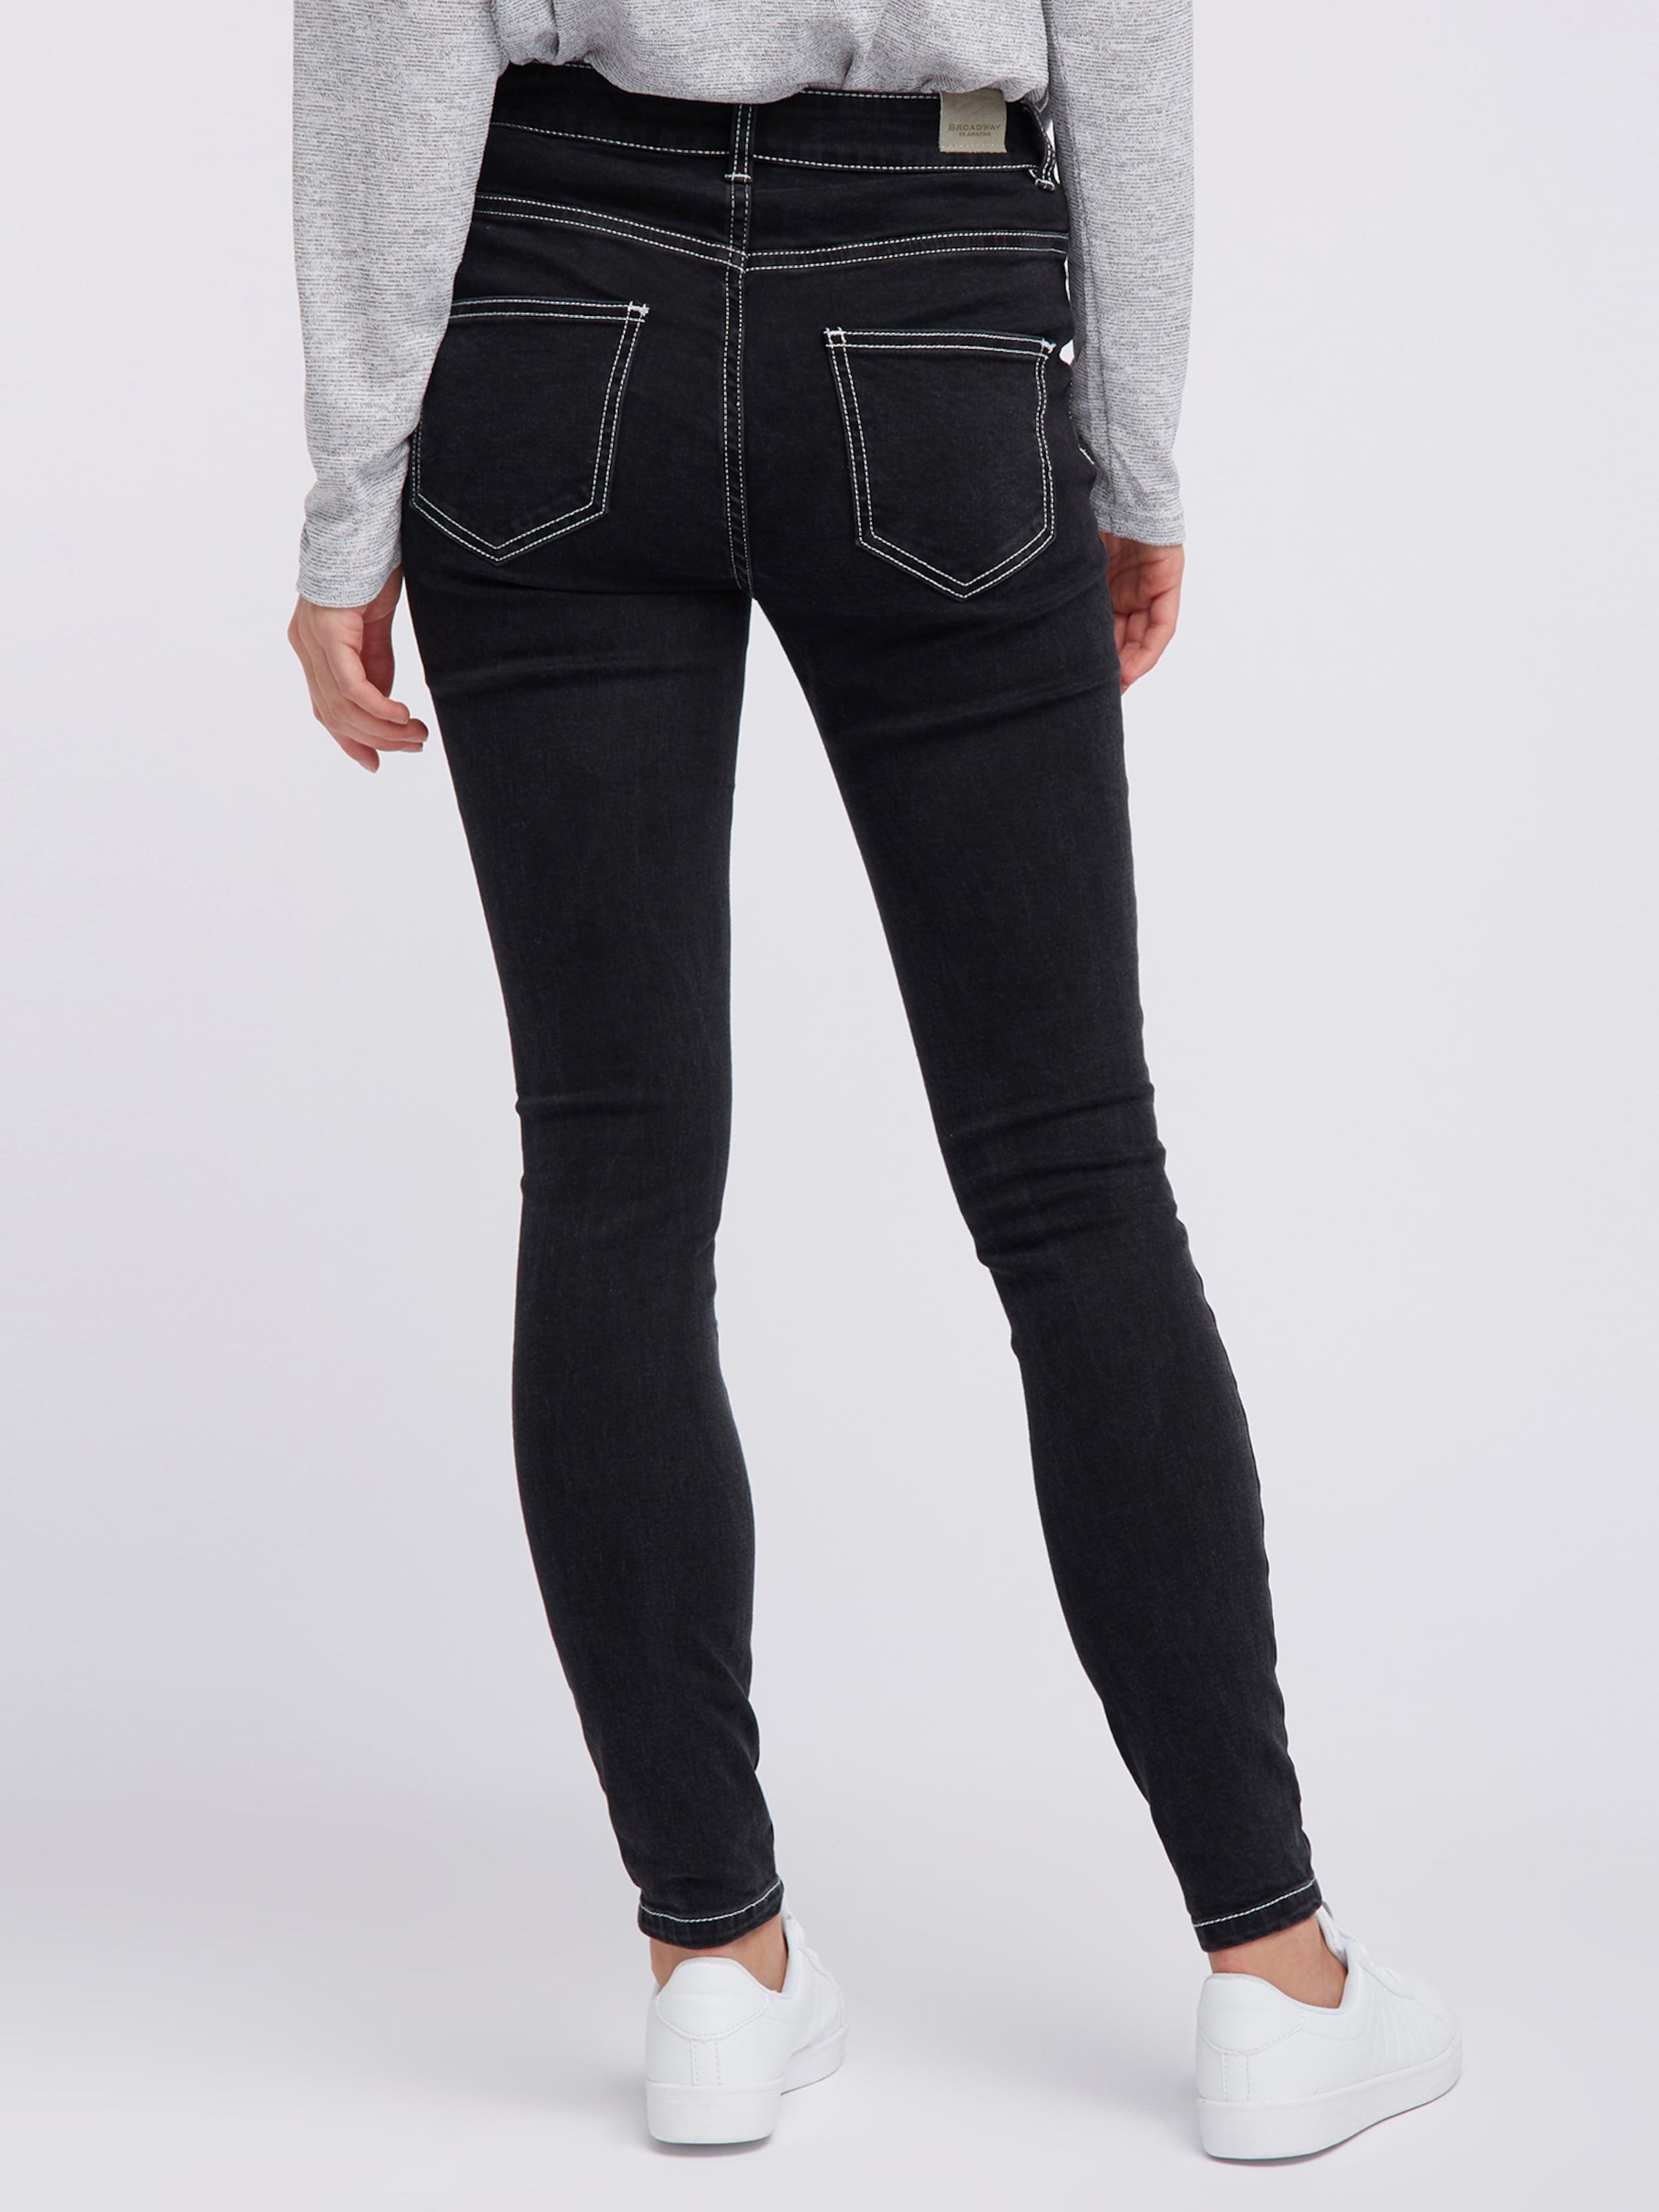 En Fashion Lou' Jean Nyc Broadway Noir 'jeans pzVqUSM